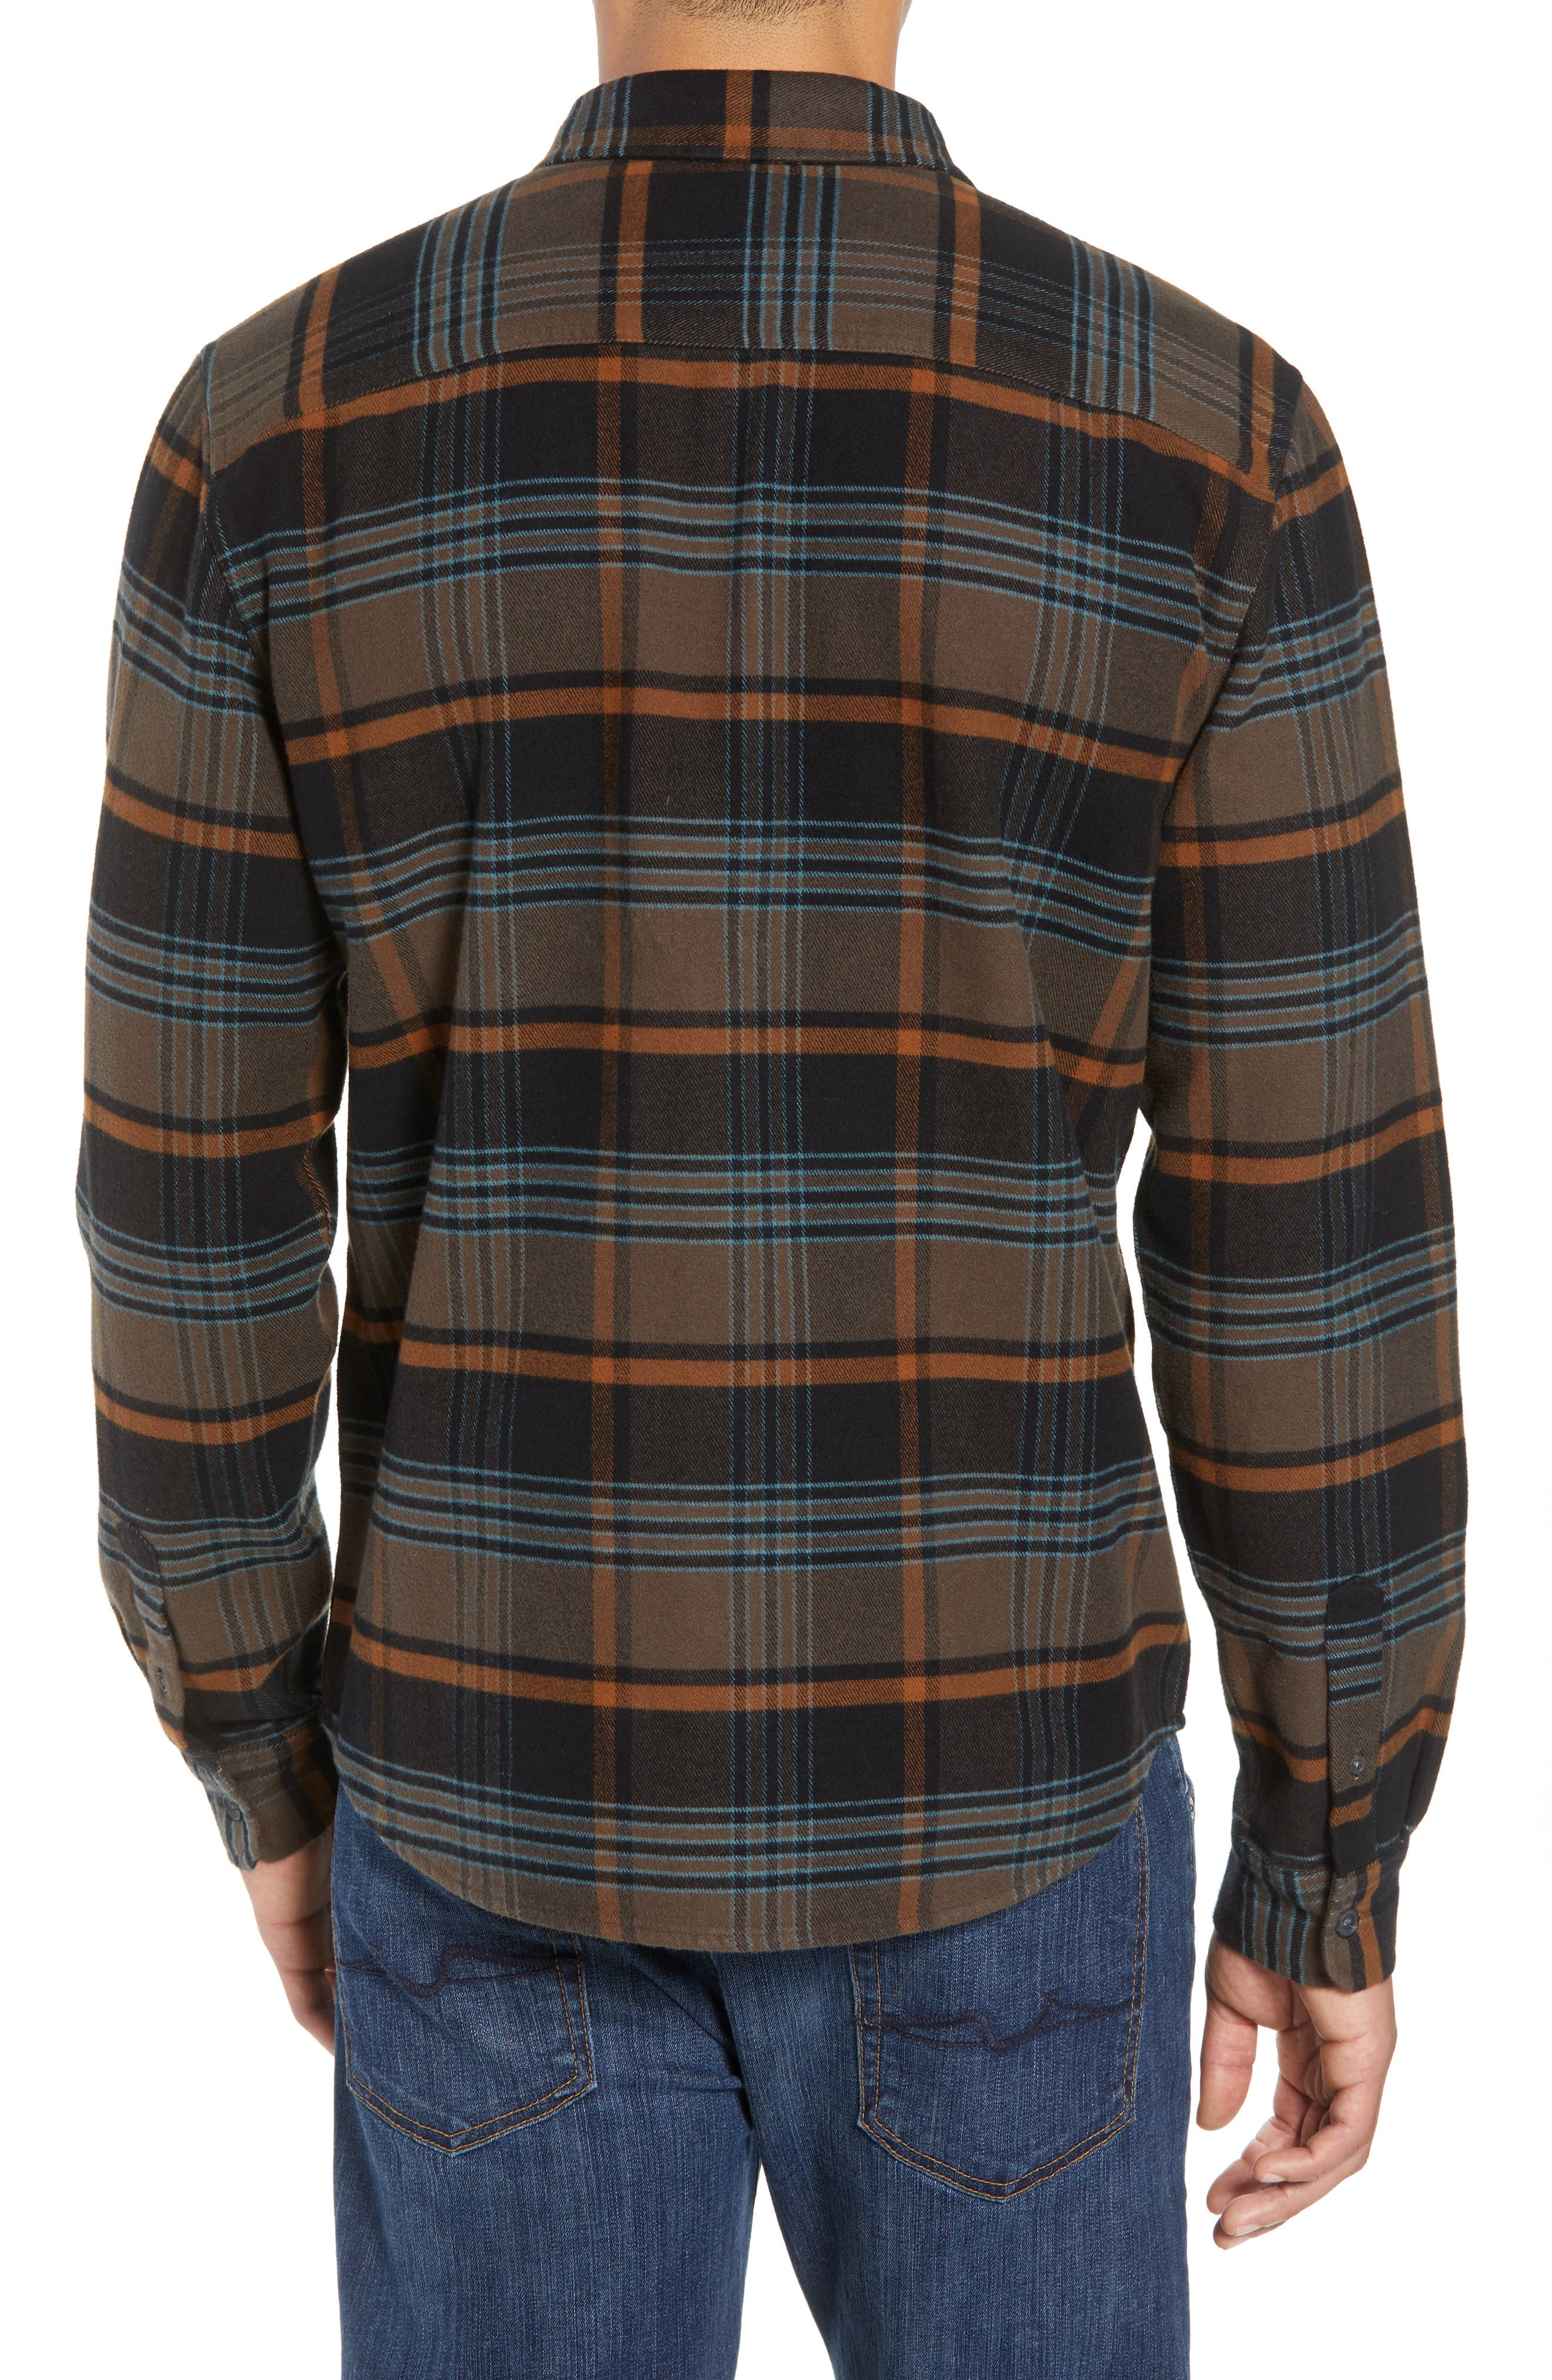 Ridgemont Flannel Shirt,                             Alternate thumbnail 2, color,                             216